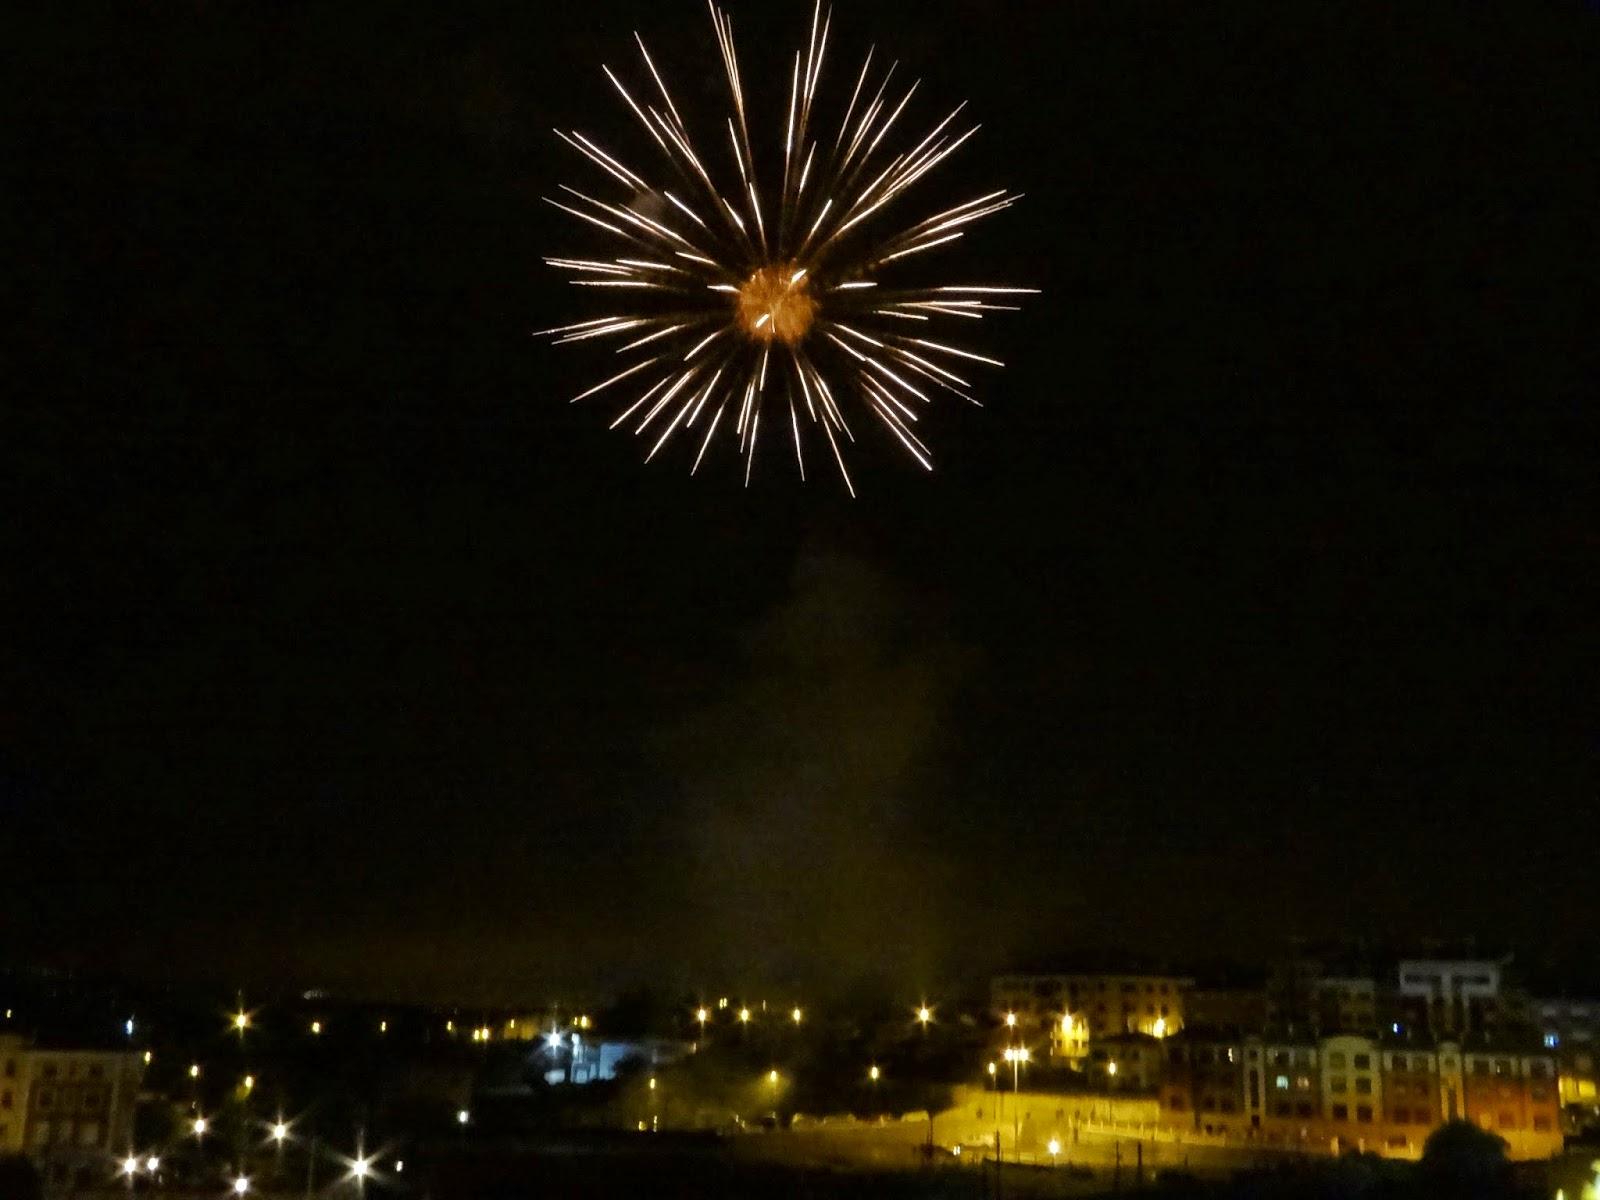 asturias fiesta de prao fuegos fireworks